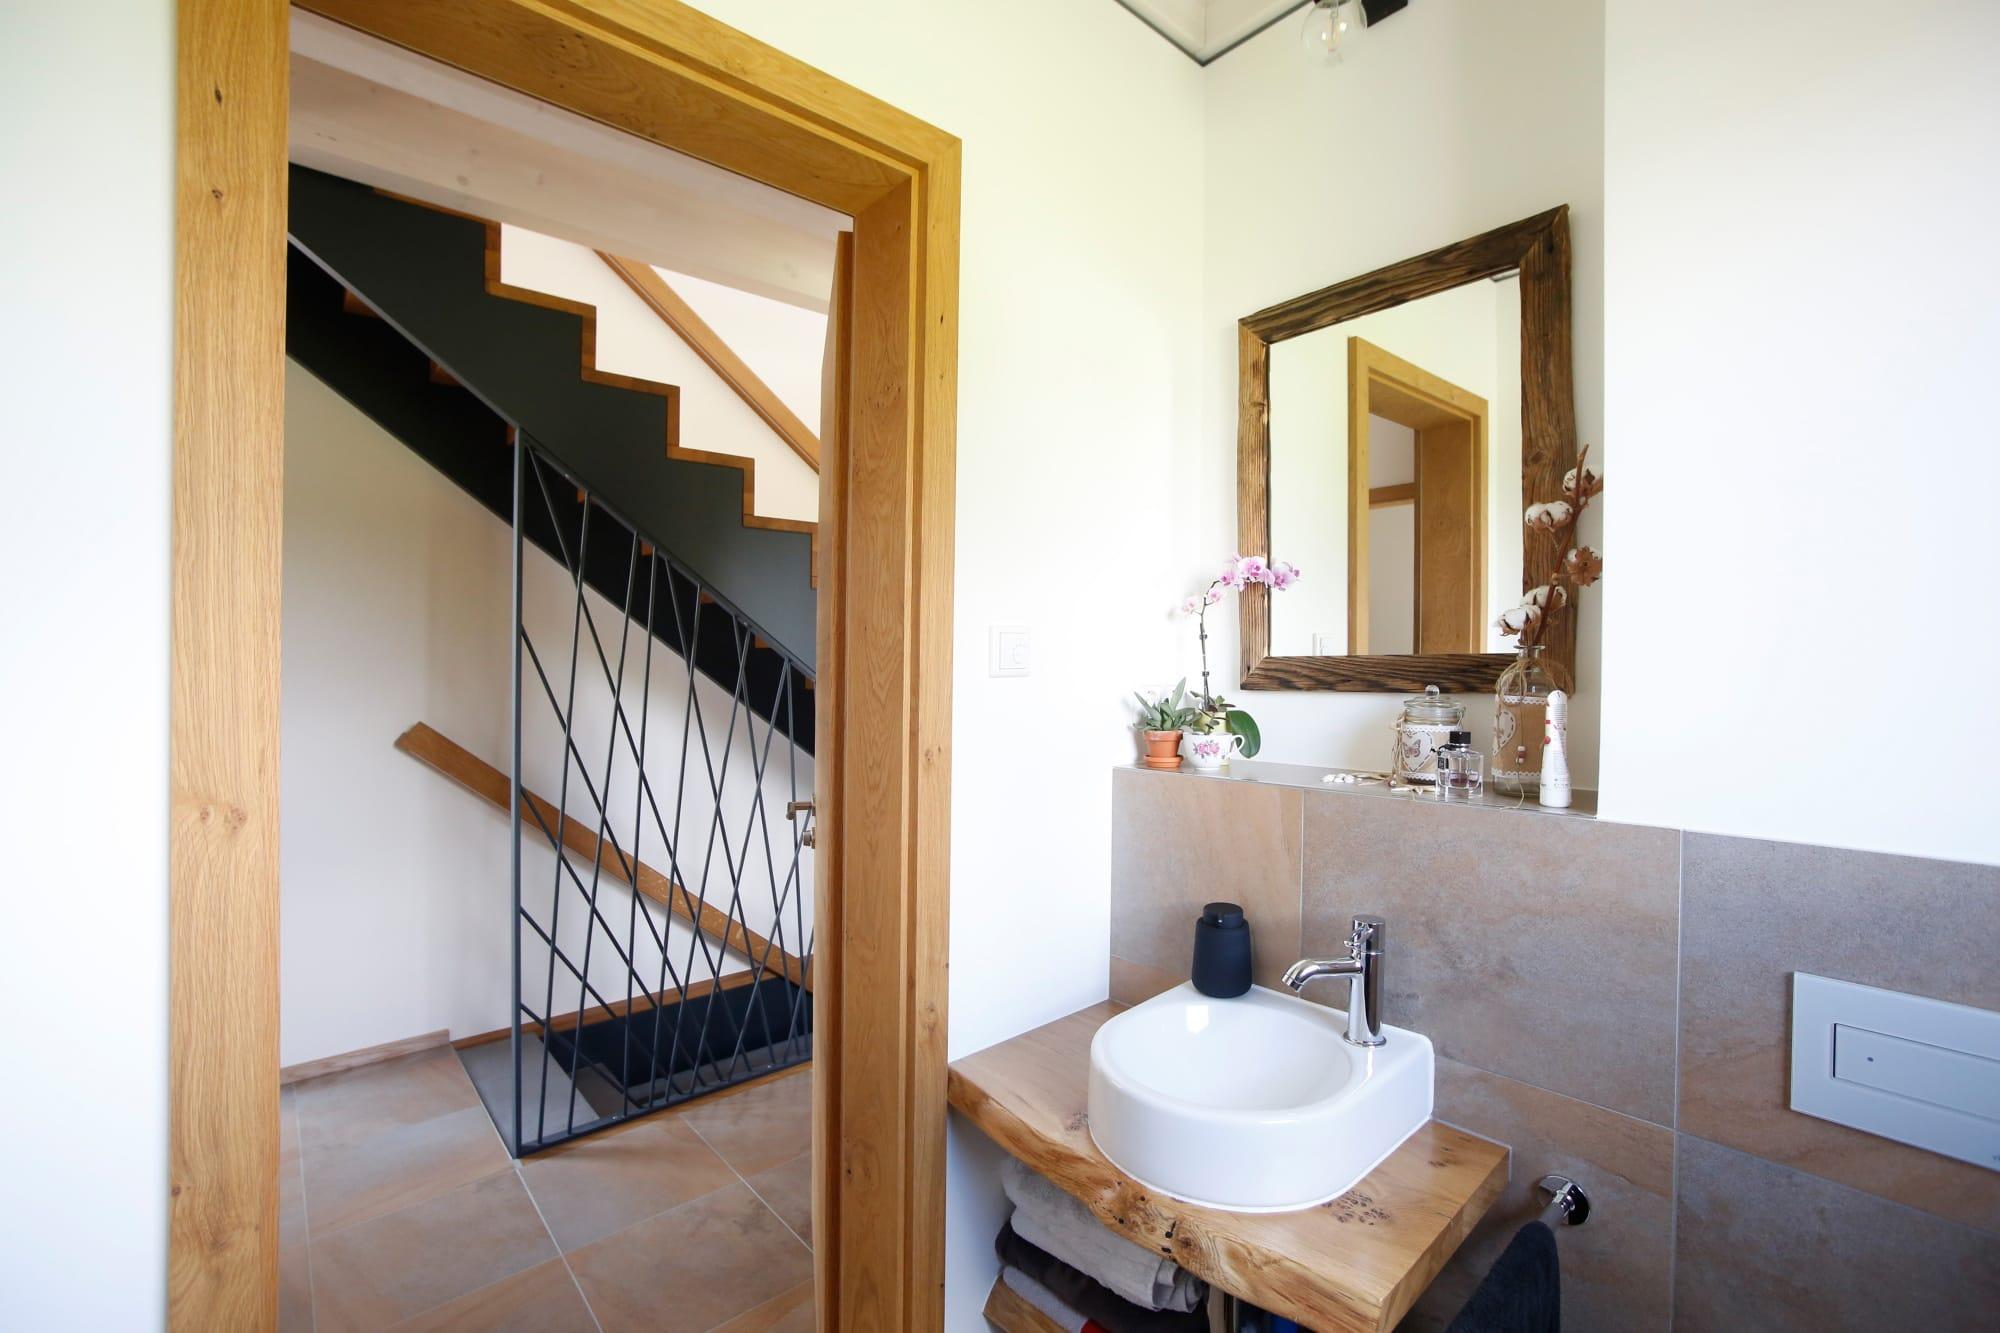 Gäste-WC - Haus Design innen modern Ideen Inneneinrichtung Baufritz ÖKOHAUS SCHELLENBERG - HausbauDirekt.de